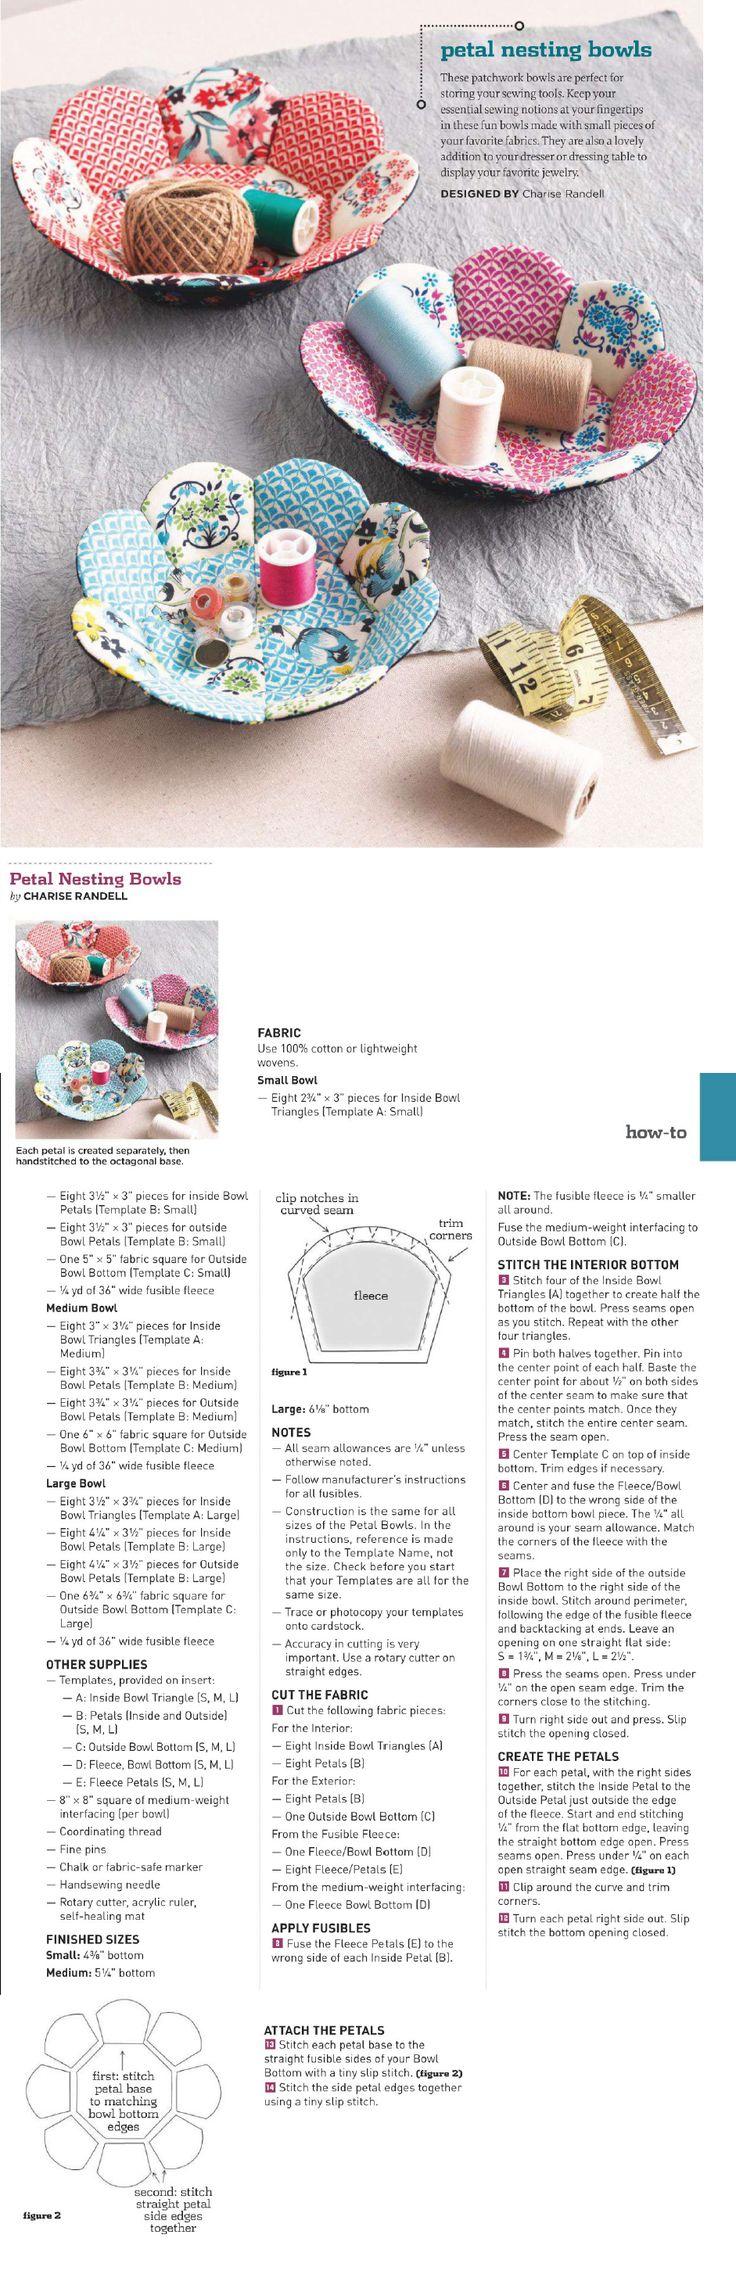 Petal Nesting Bowls